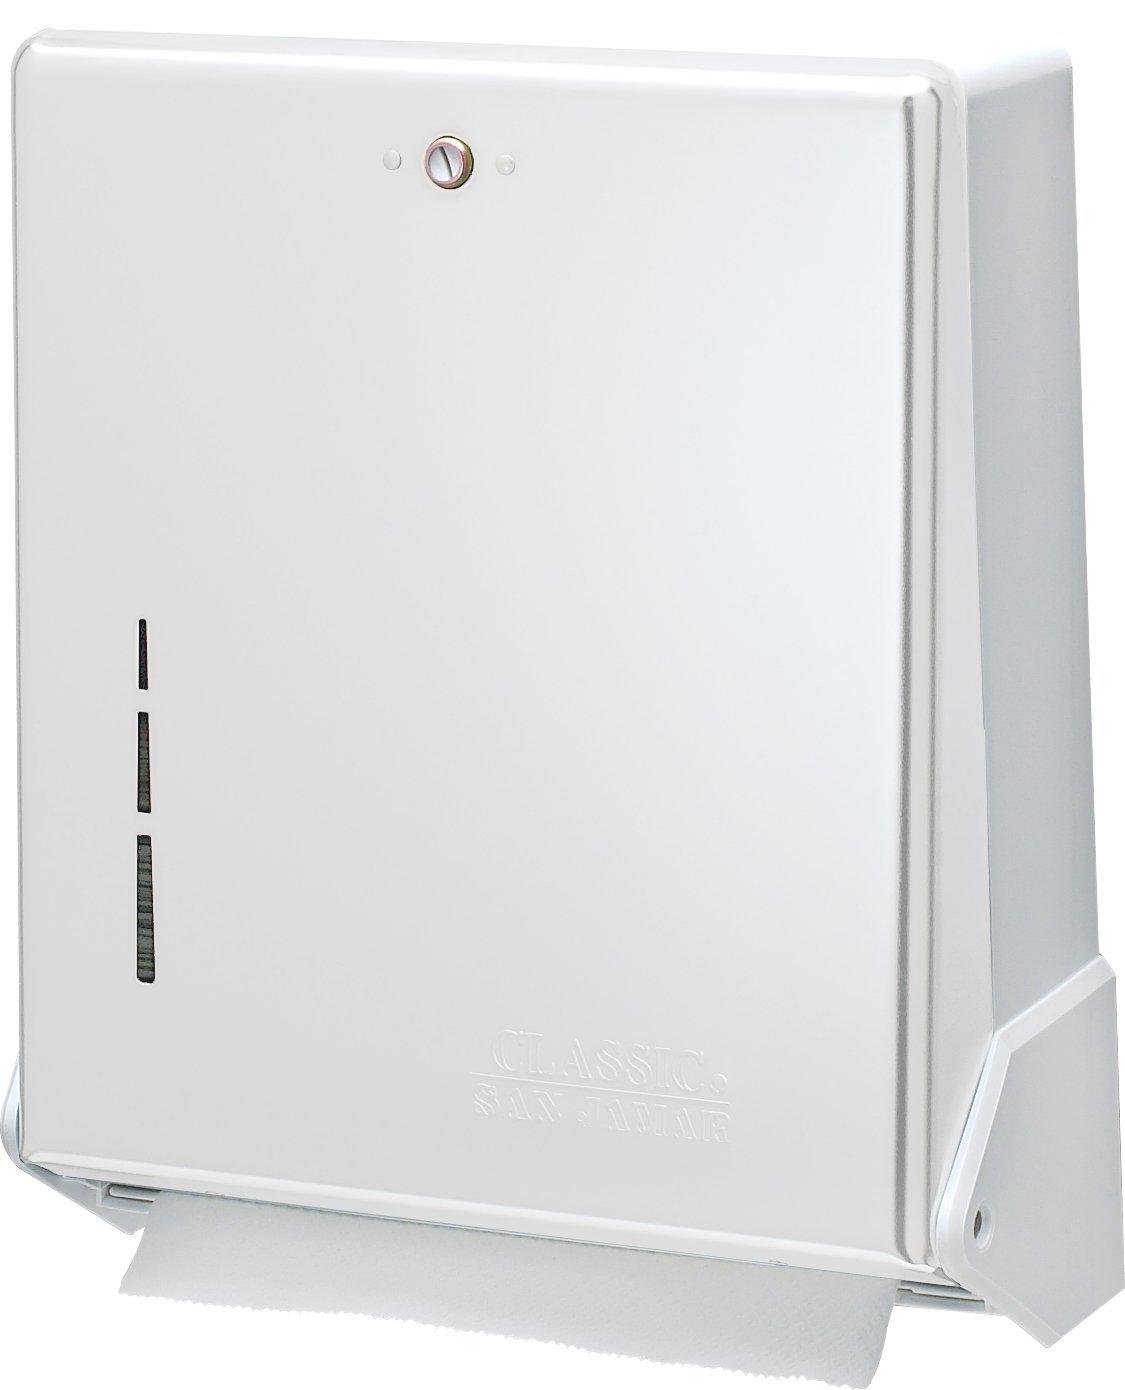 250 Multifold San Jamar T1950XC Mini C-Fold//Multifold/Commercial Towel Dispenser Chrome 150 C-Fold Towel Capacity